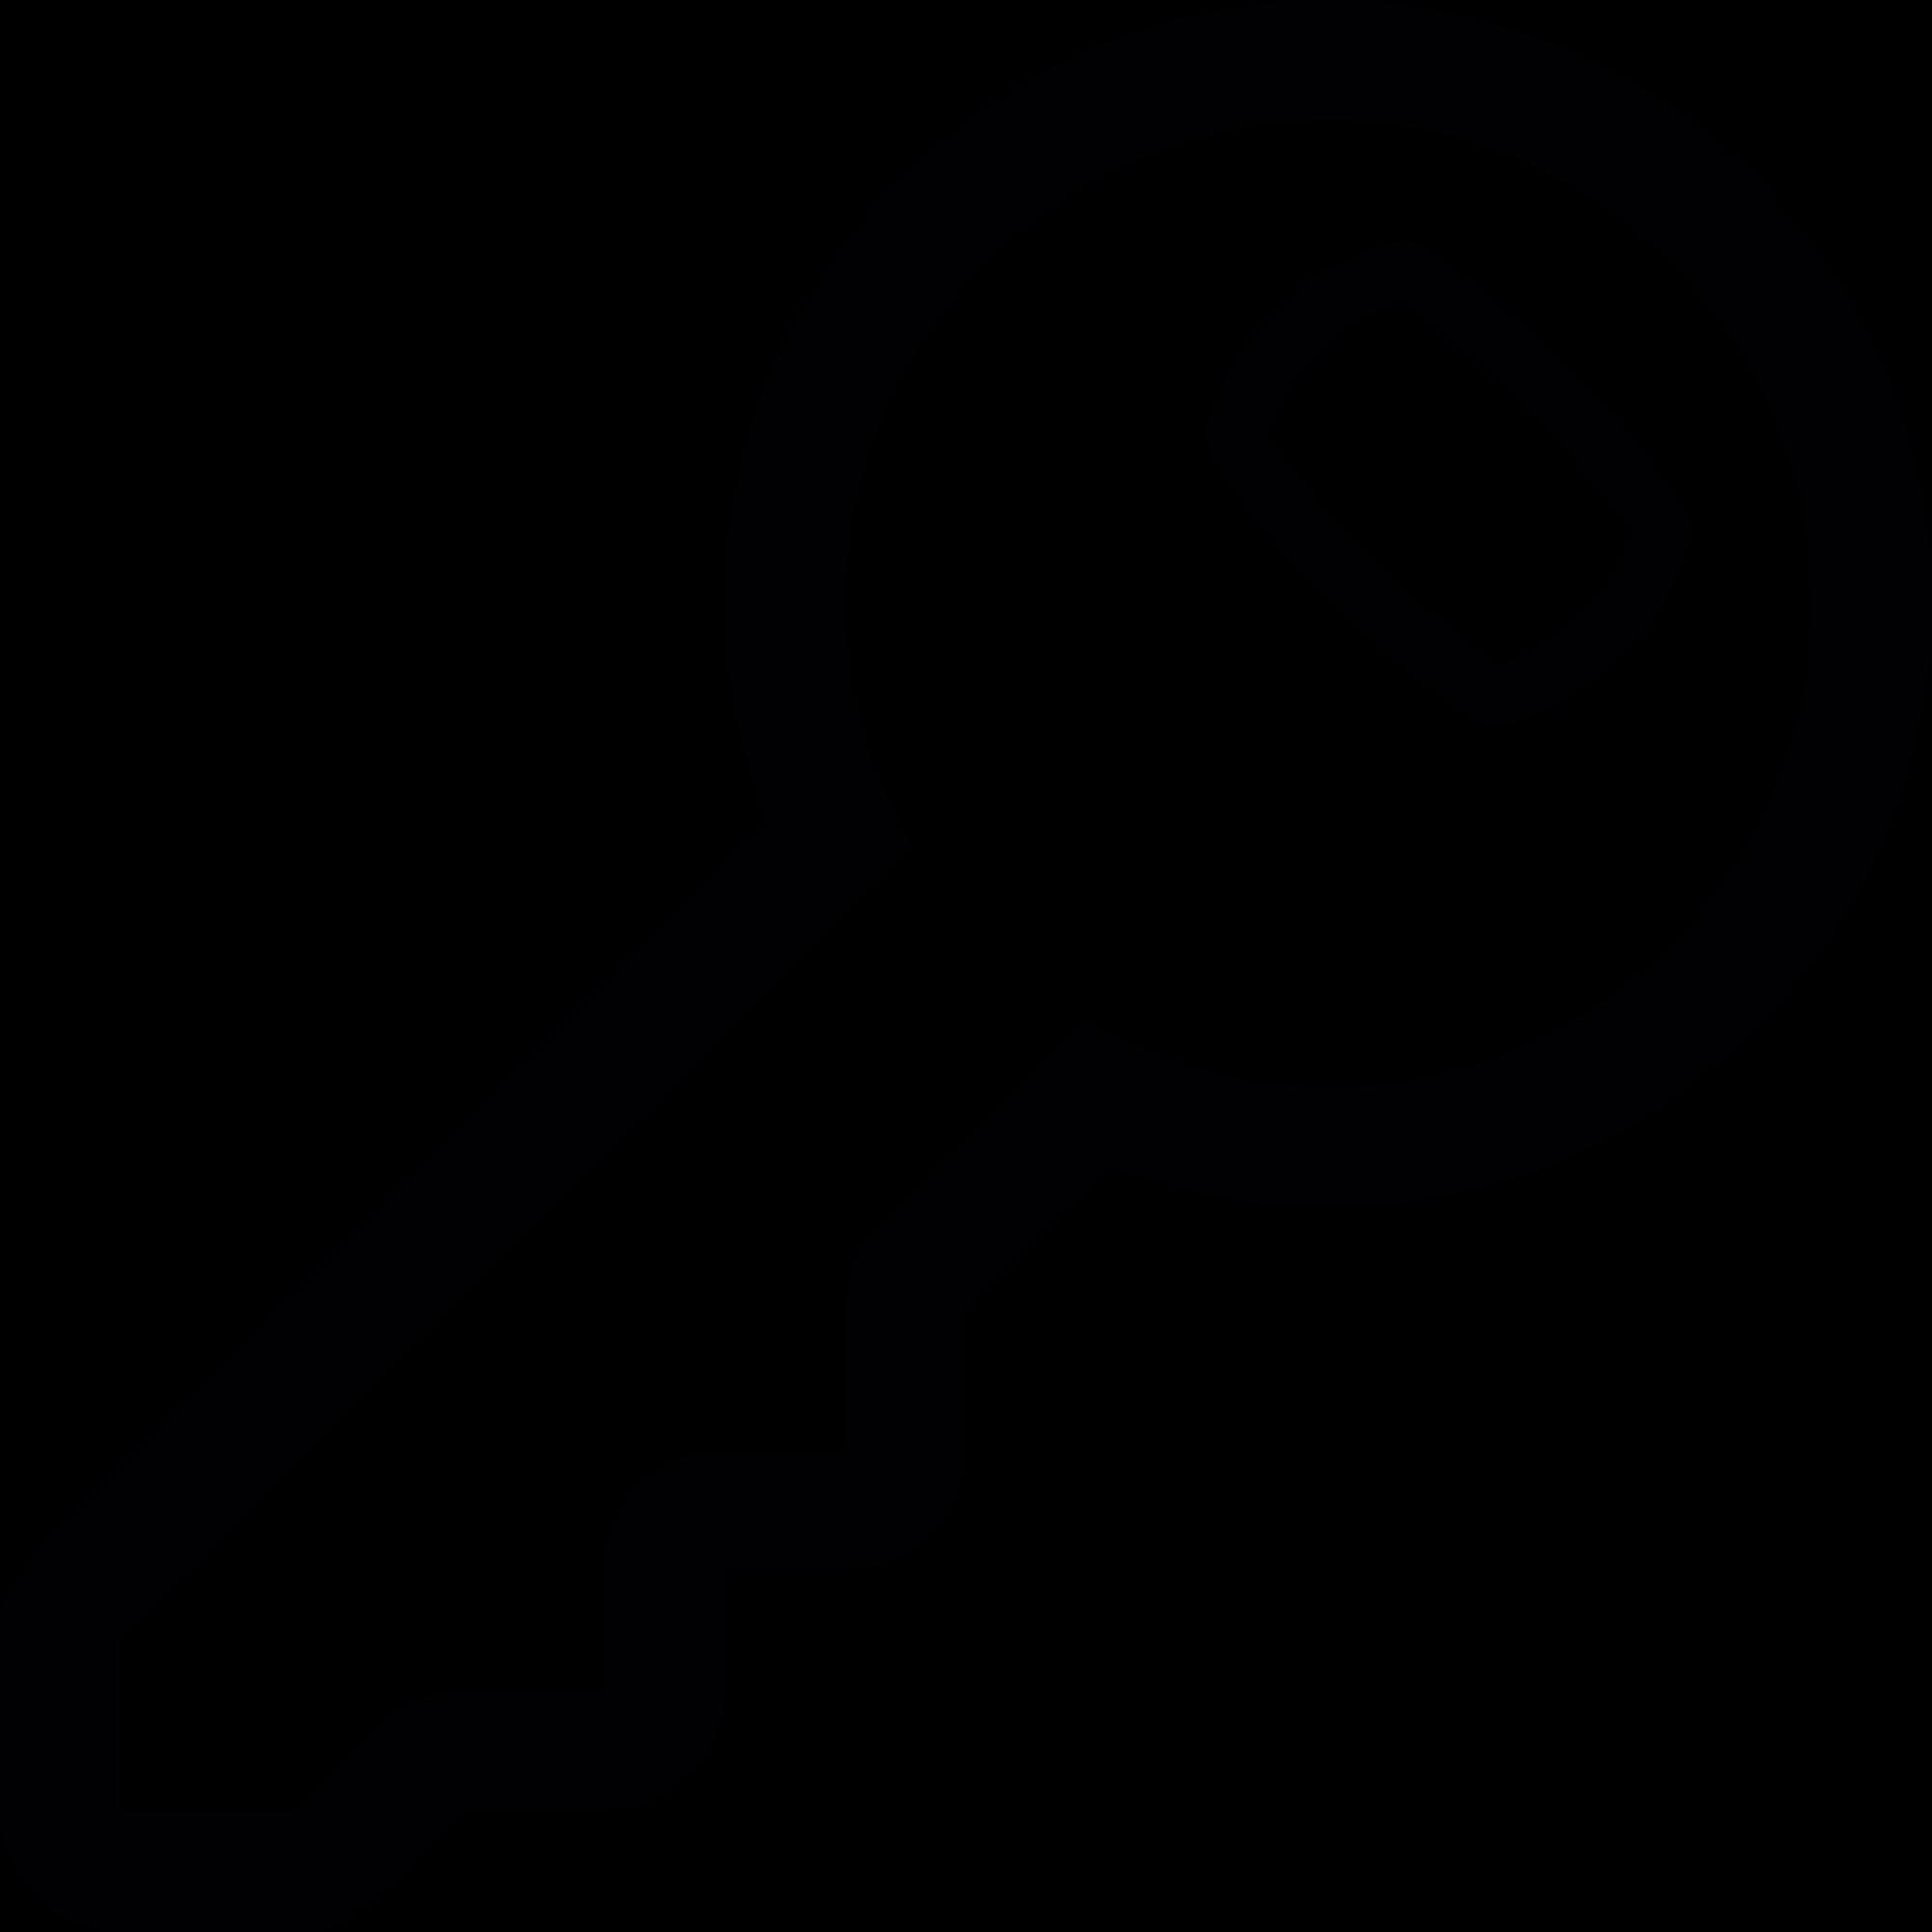 Key clipart small key. File linecons svg wikimedia